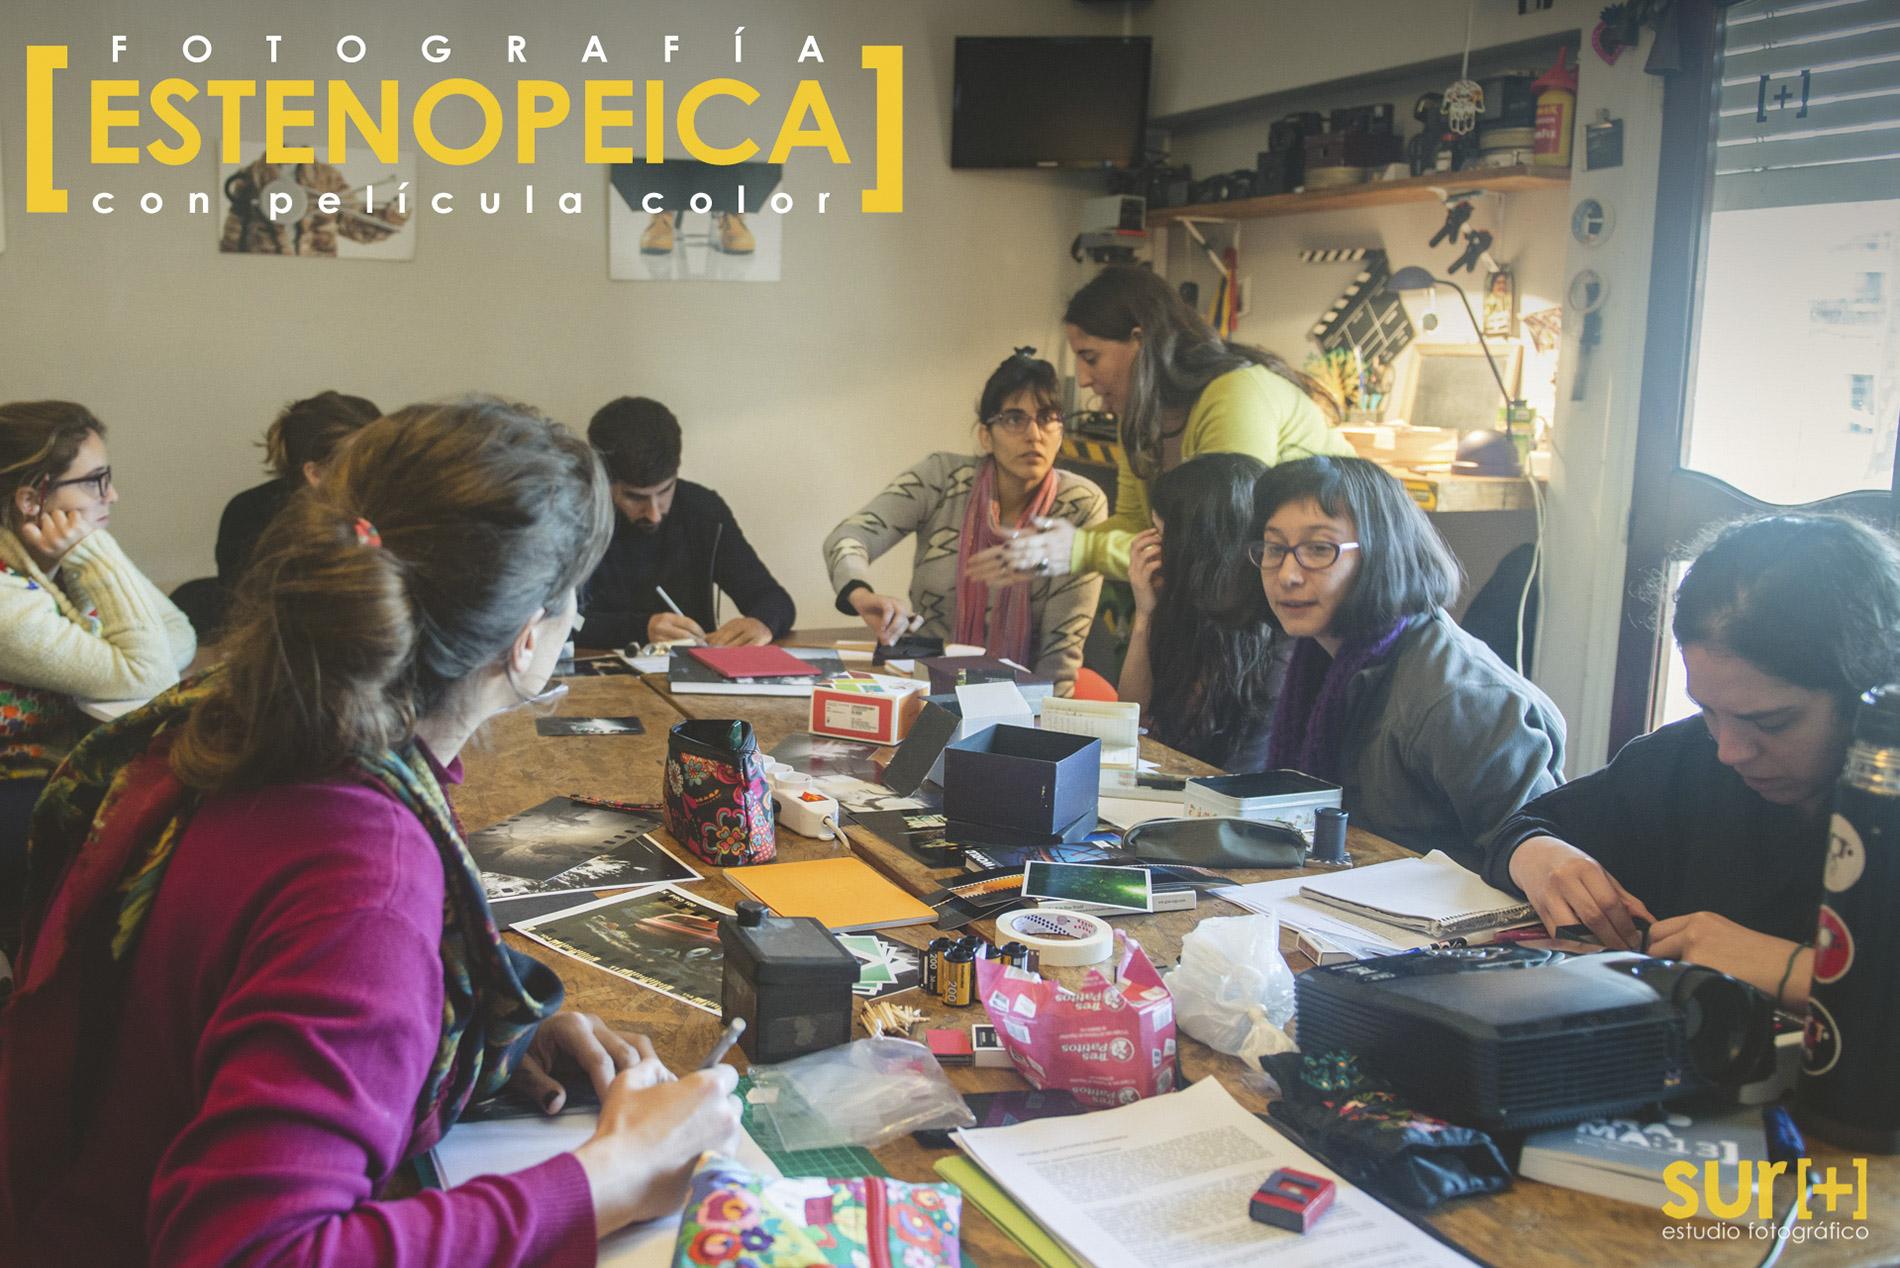 Workshop de fotografia estenopeica 2015-5 copia